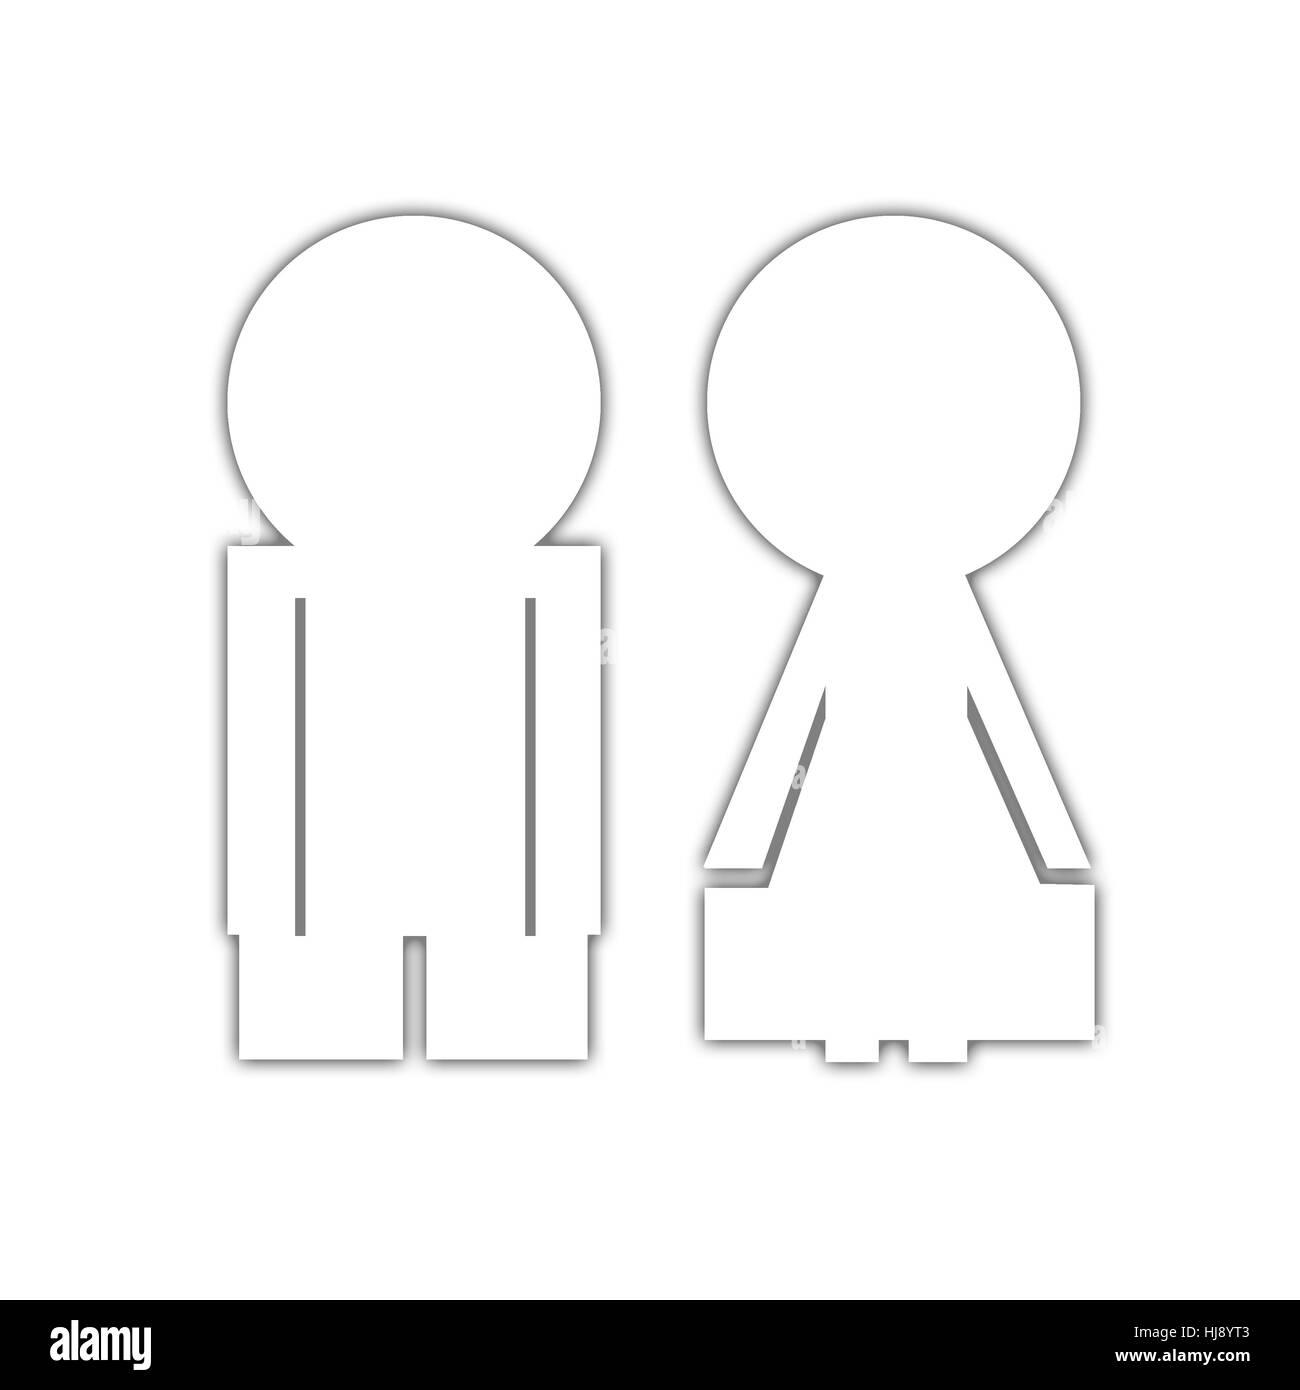 woman, illustration, sanitary, white, pictogram, symbol, pictograph, trade - Stock Image